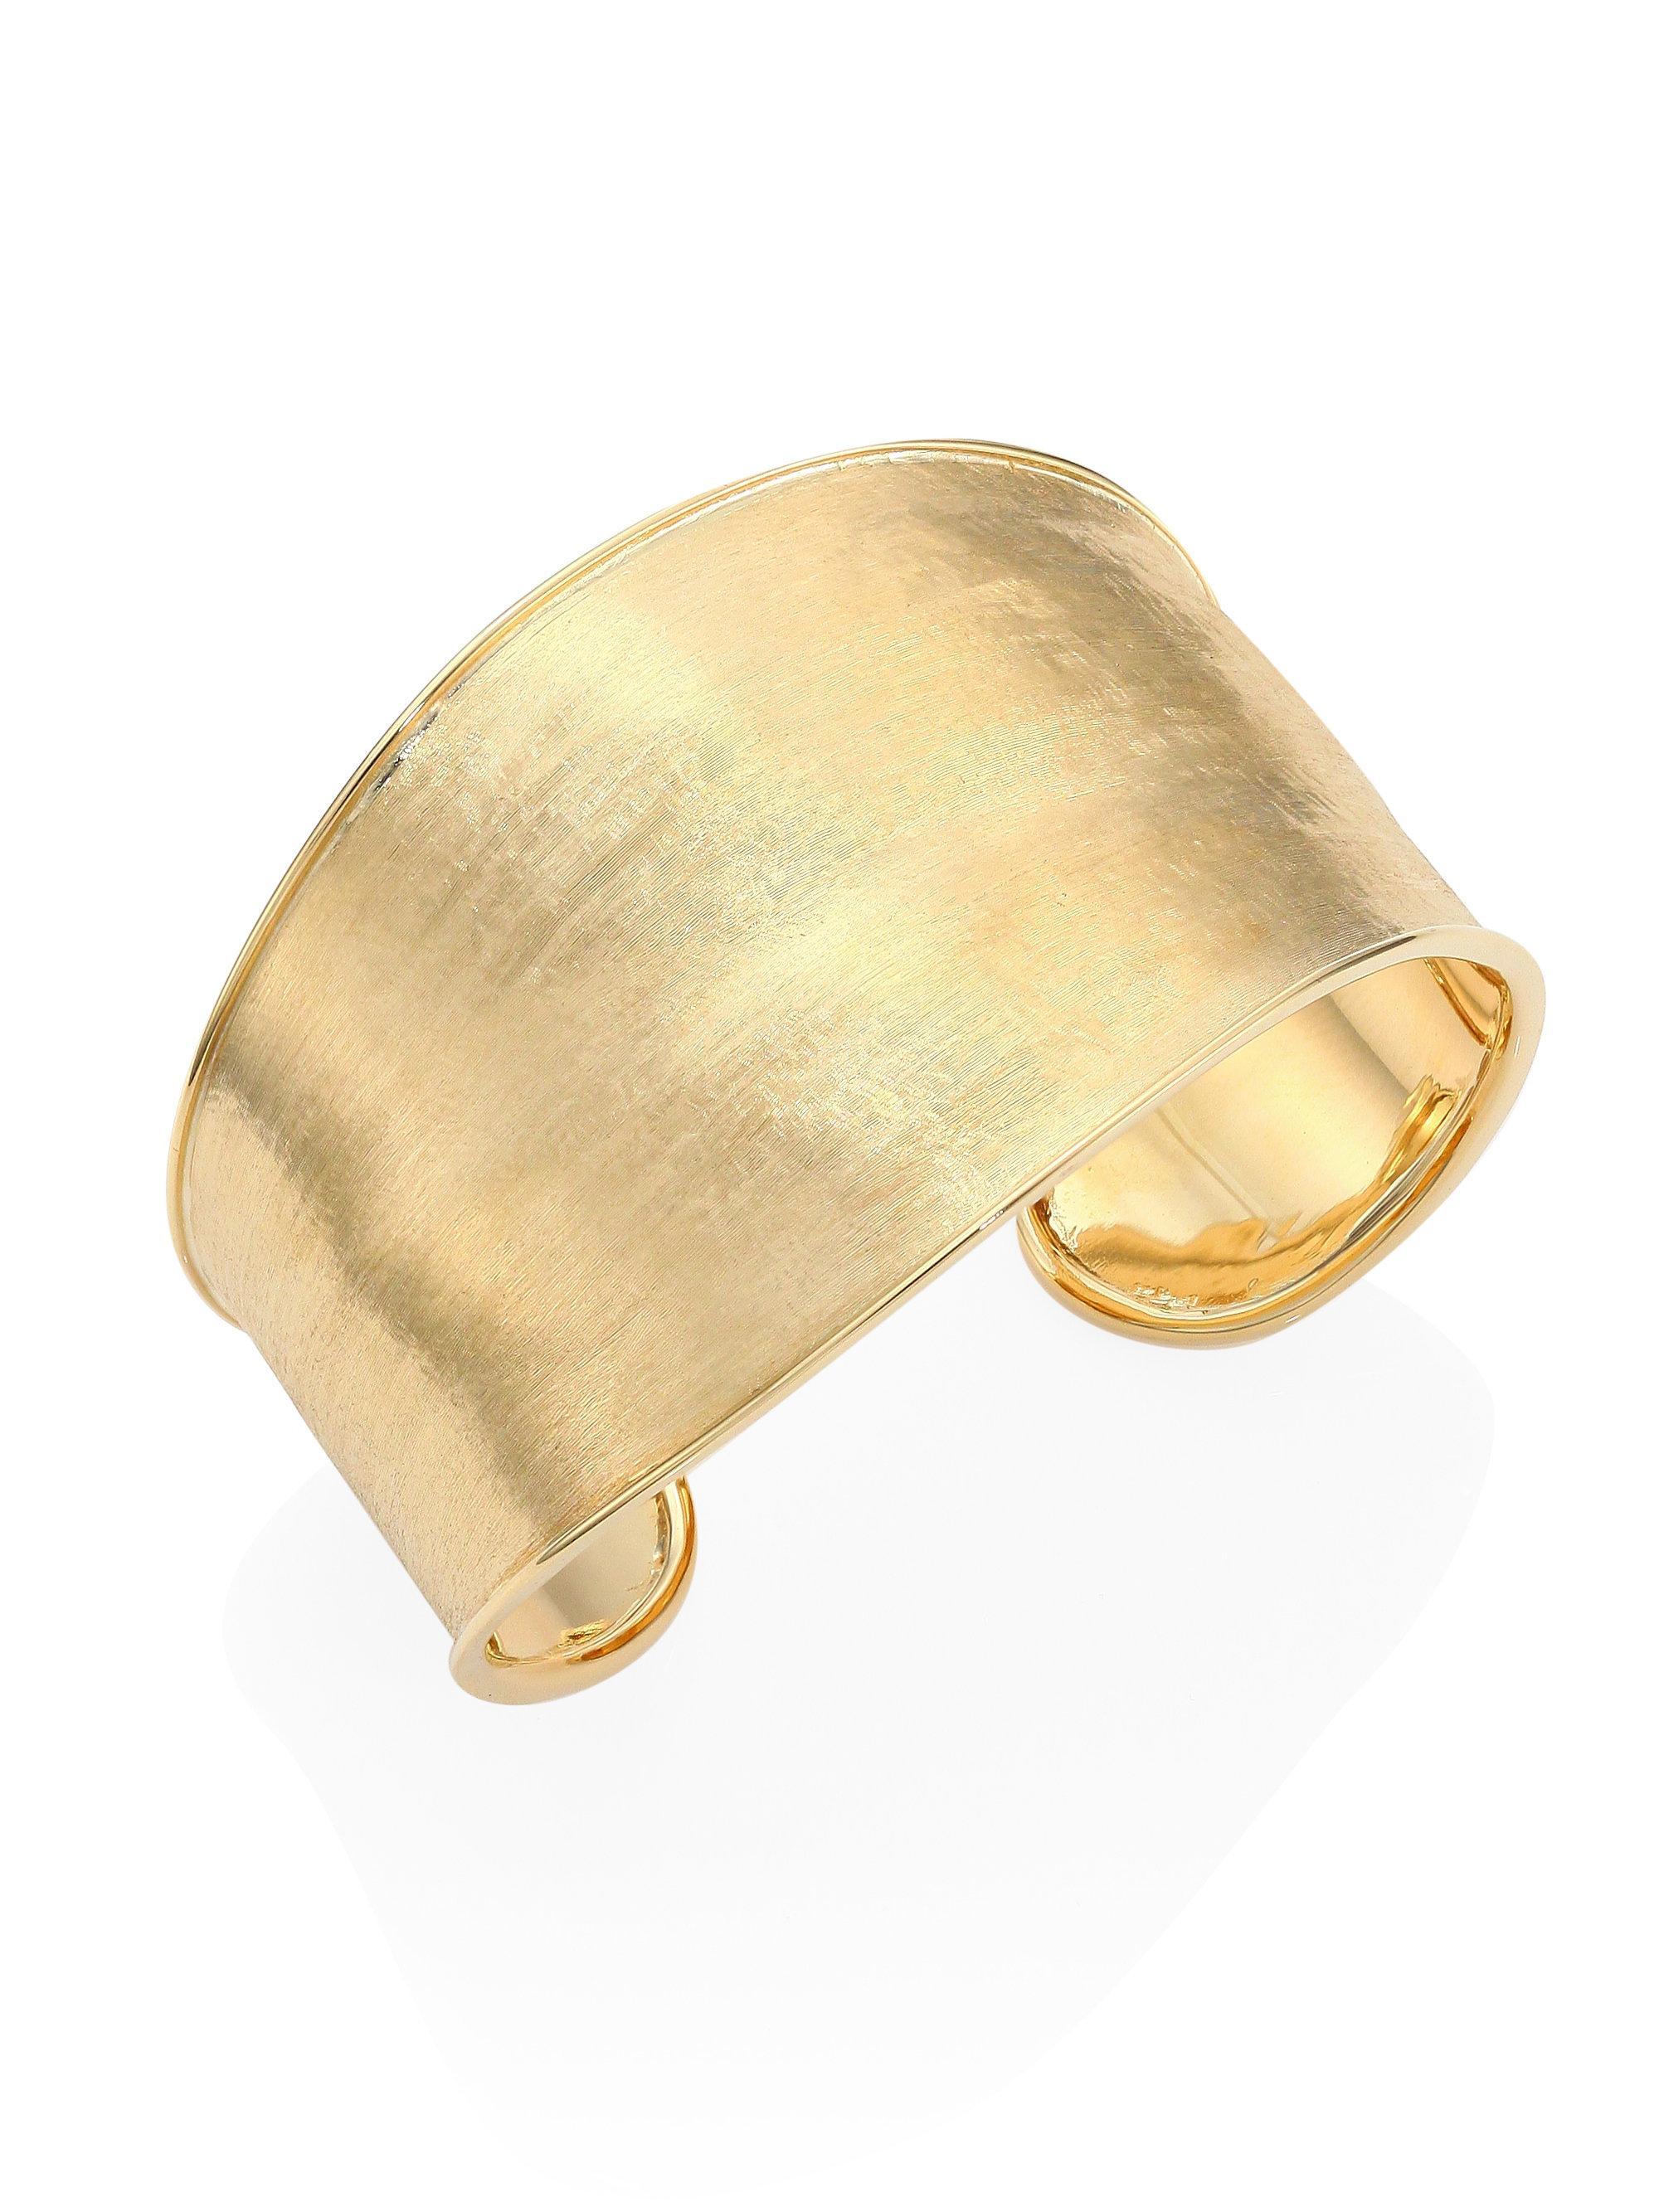 Marco Bicego Lunaria Cuff Bracelet in 18K Yellow Gold AV5FWtx